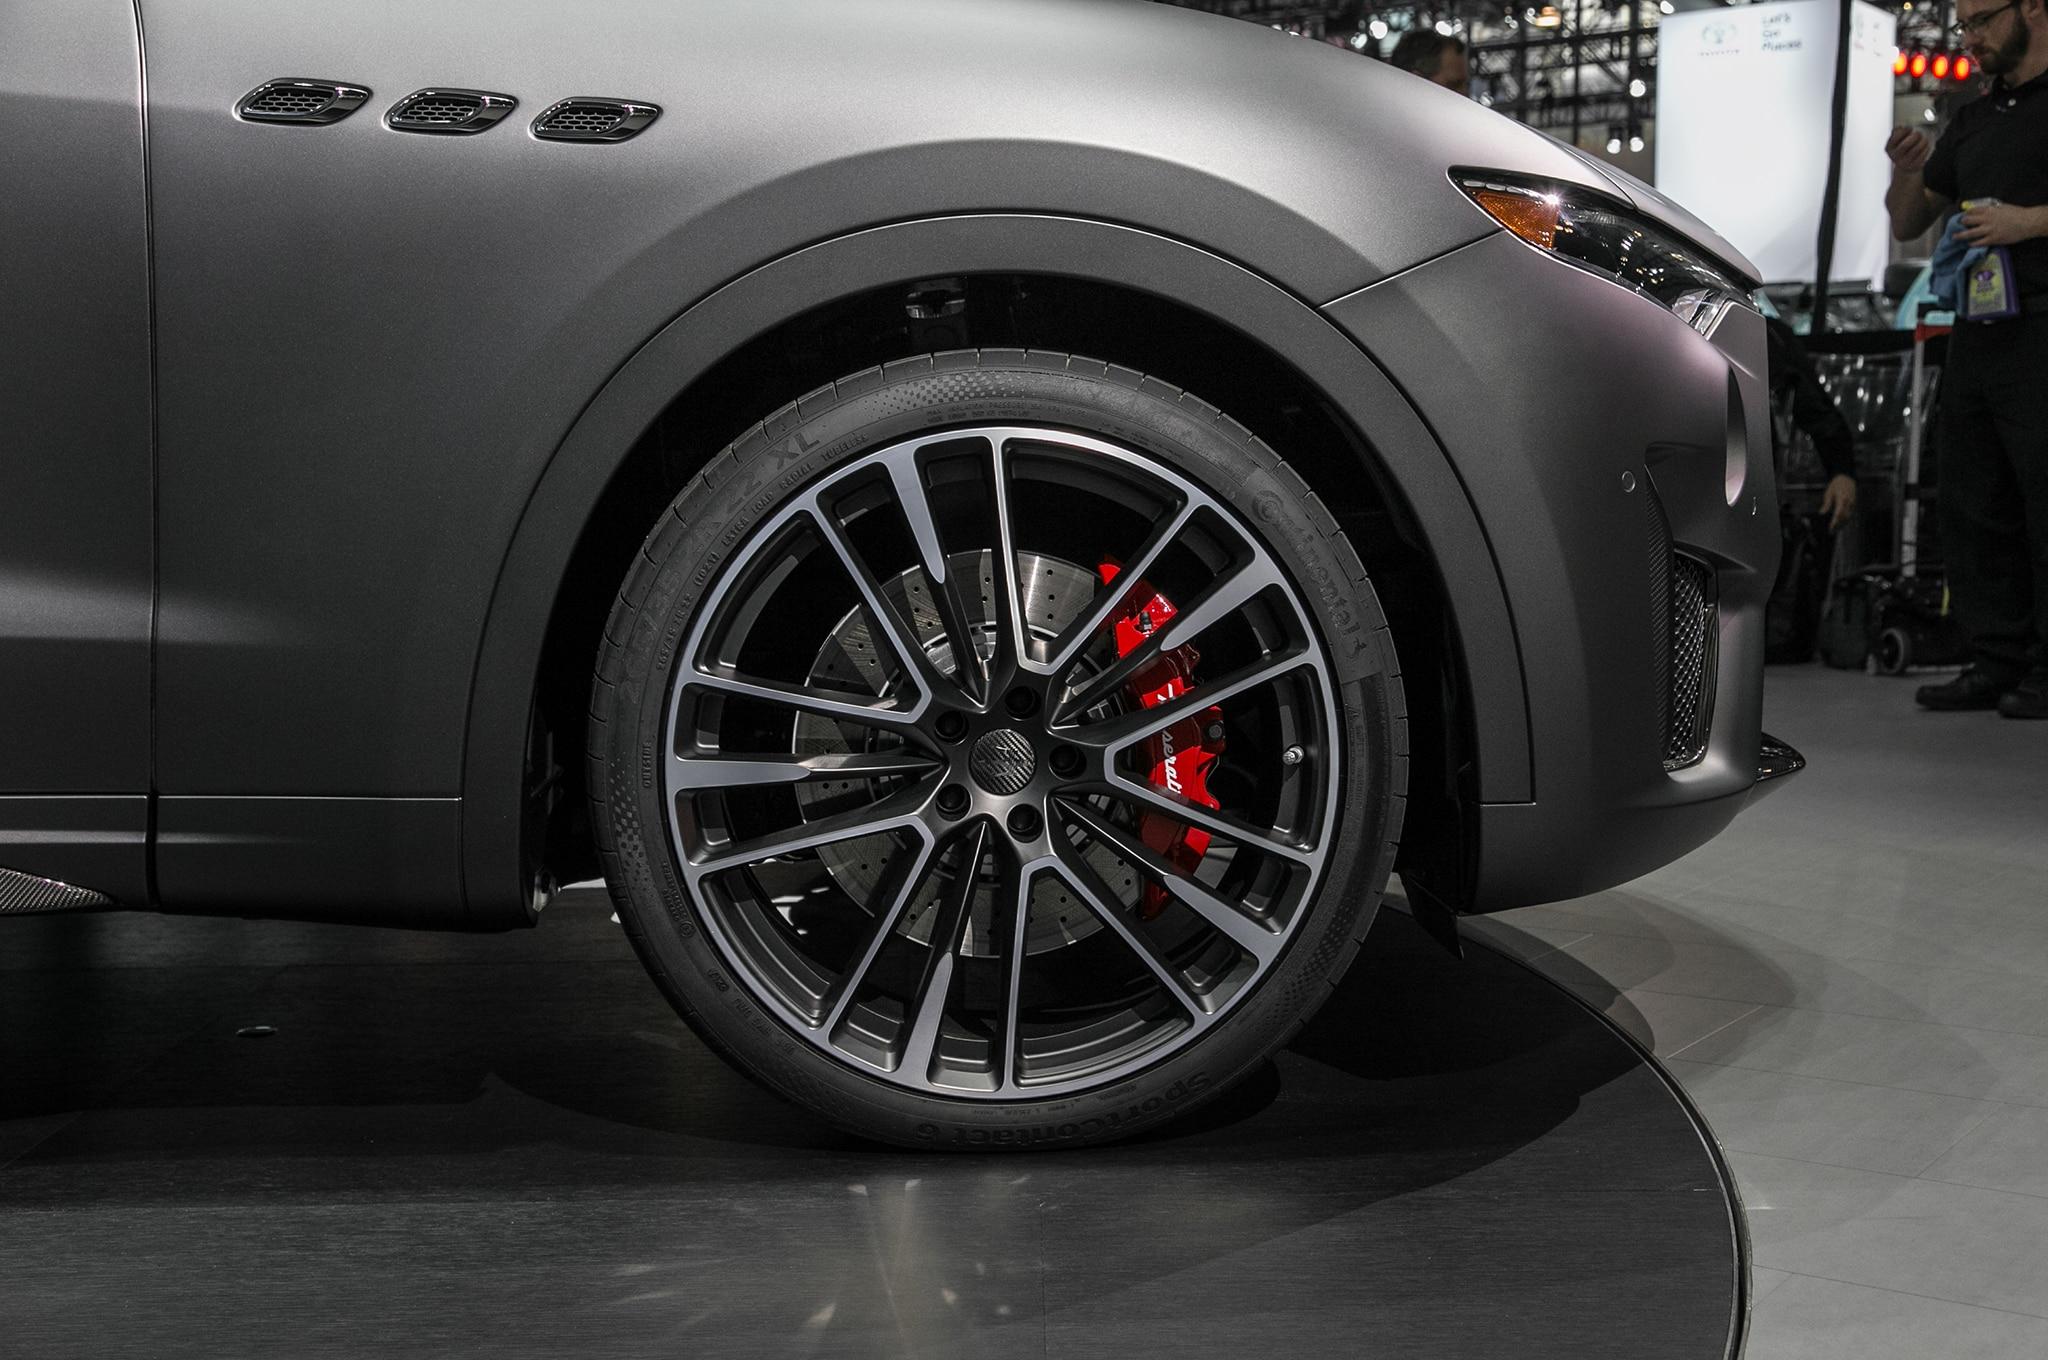 2019 Maserati Levante Trofeo Is One Of The Quickest Maseratis Yet